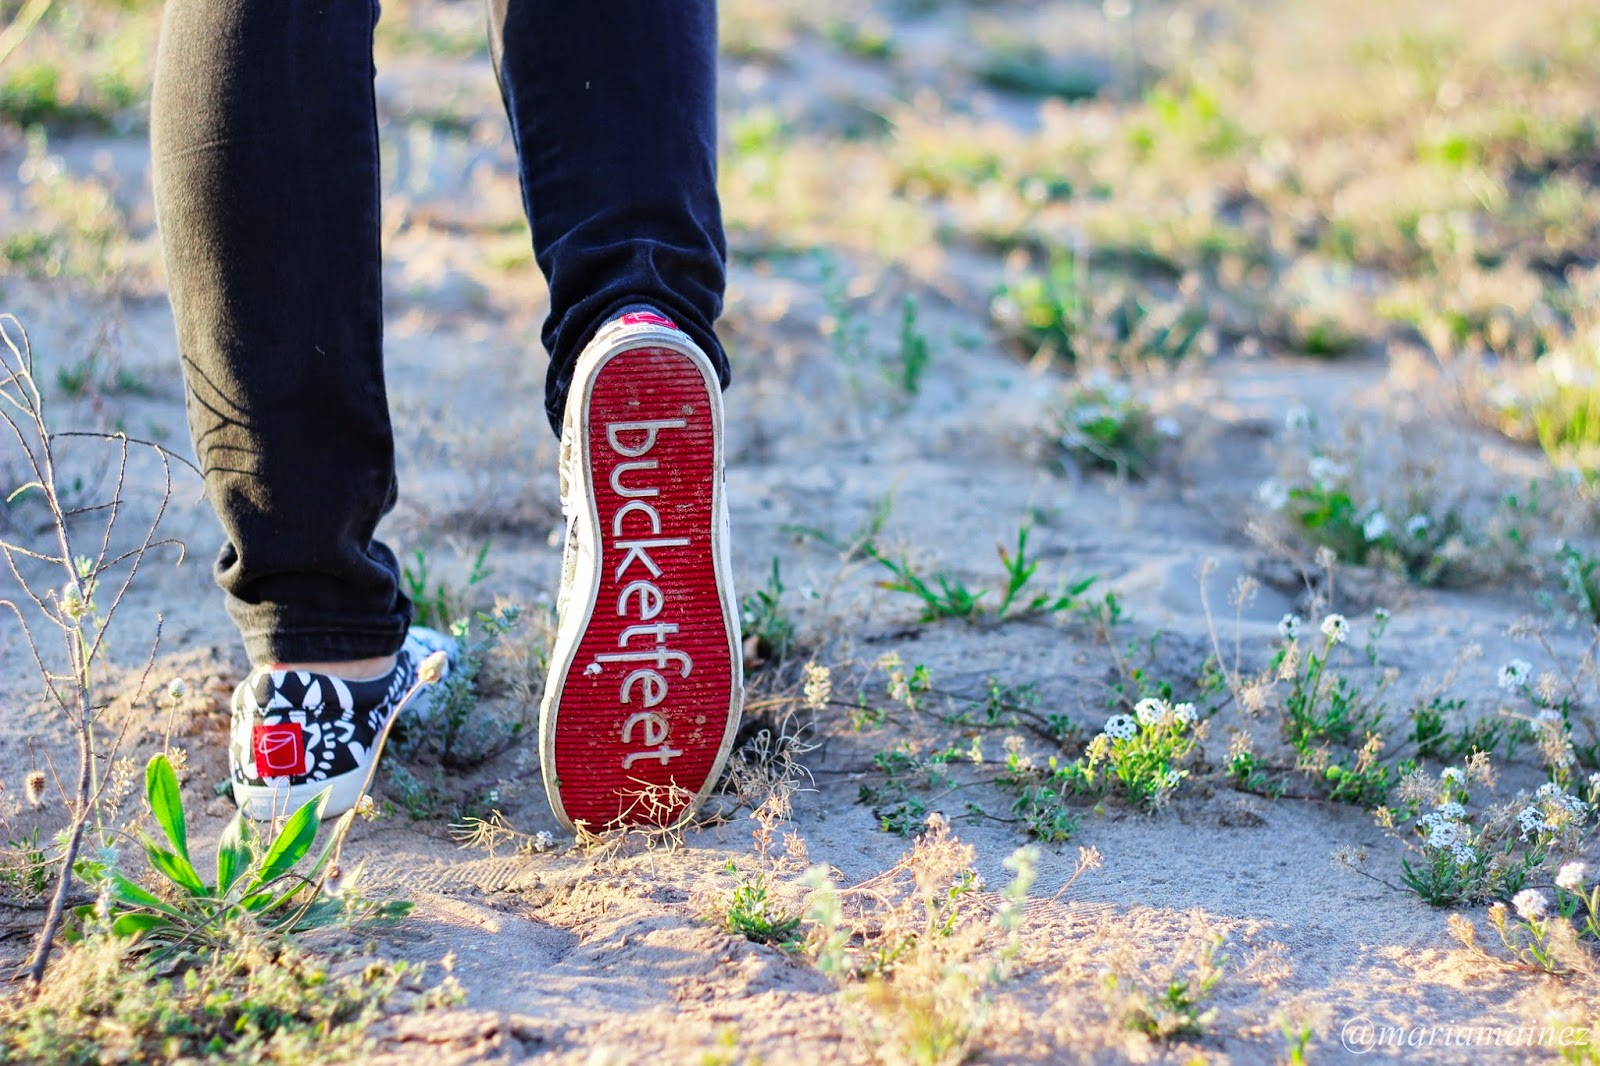 Bucketfeet - fashion blogger - calzado plano - calzado cómodo - suela roja